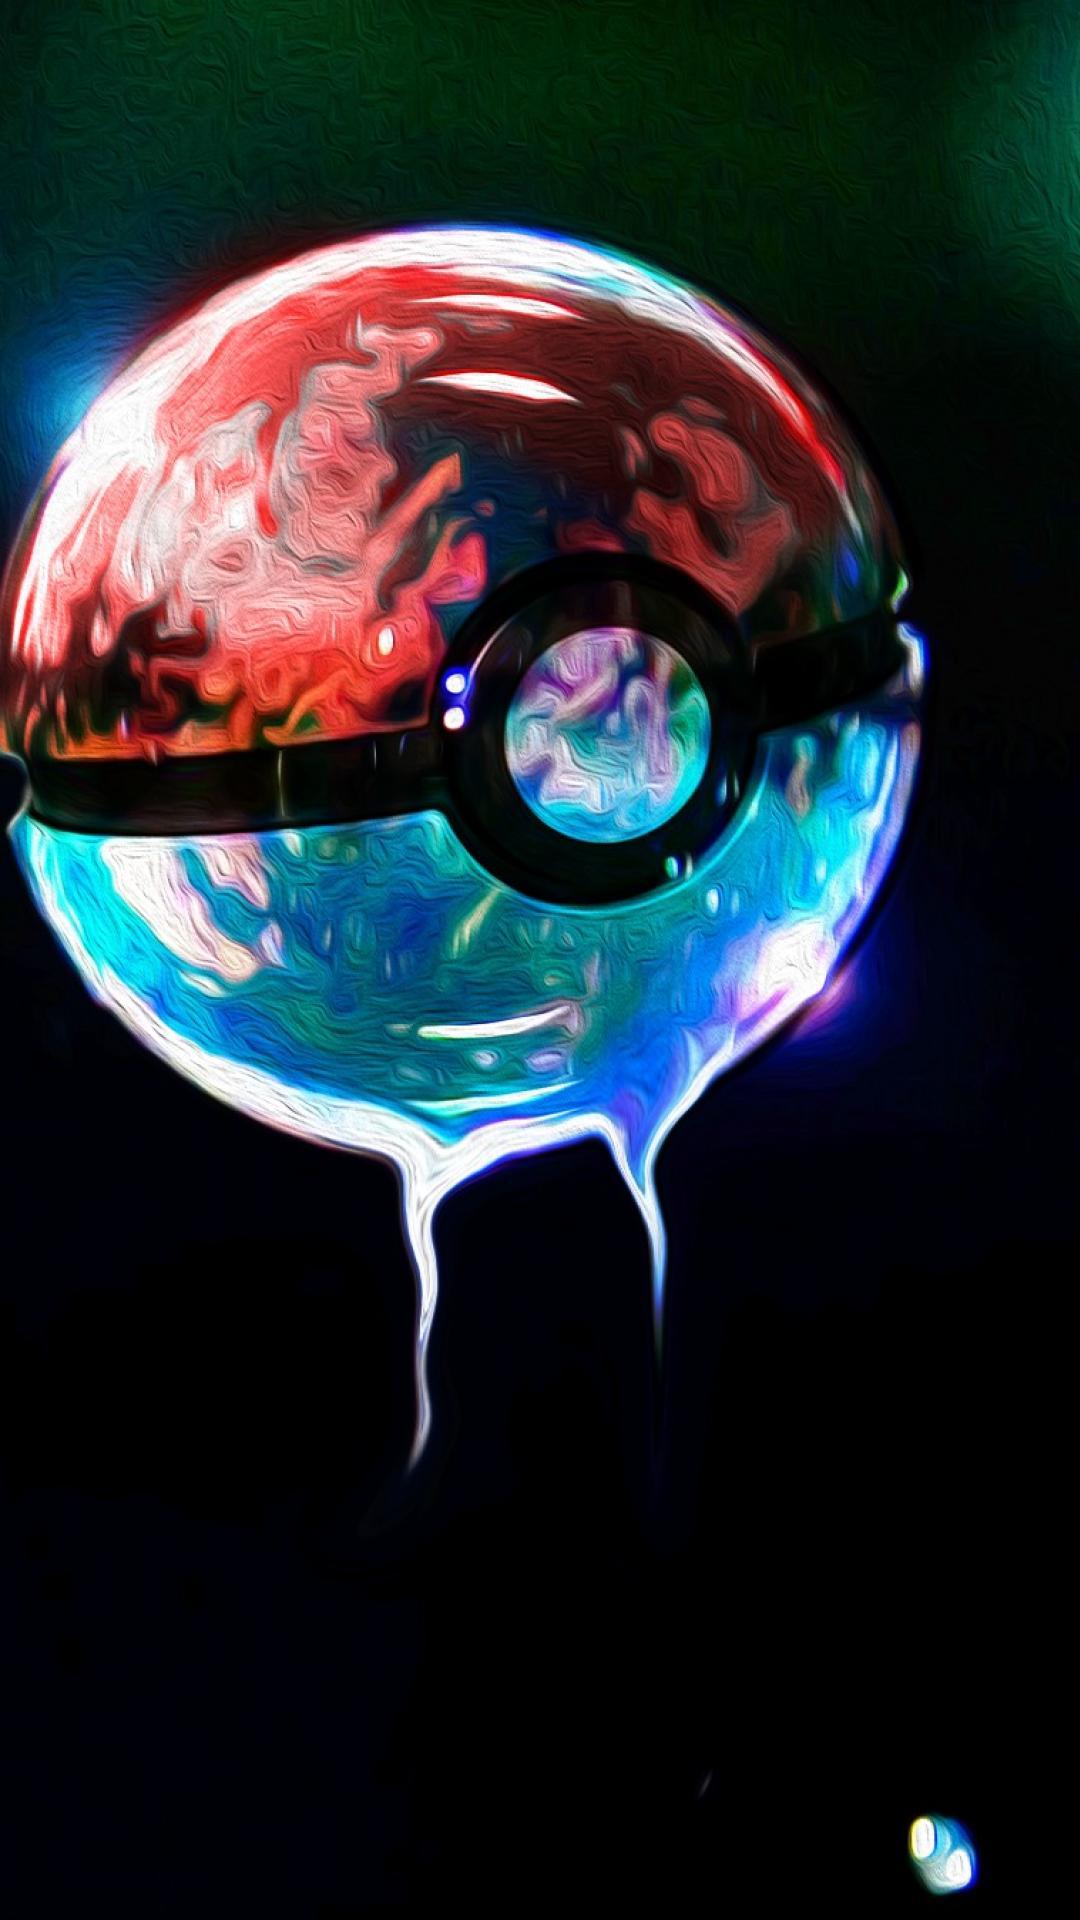 Pokémon Phone HD Wallpapers - Wallpaper Cave